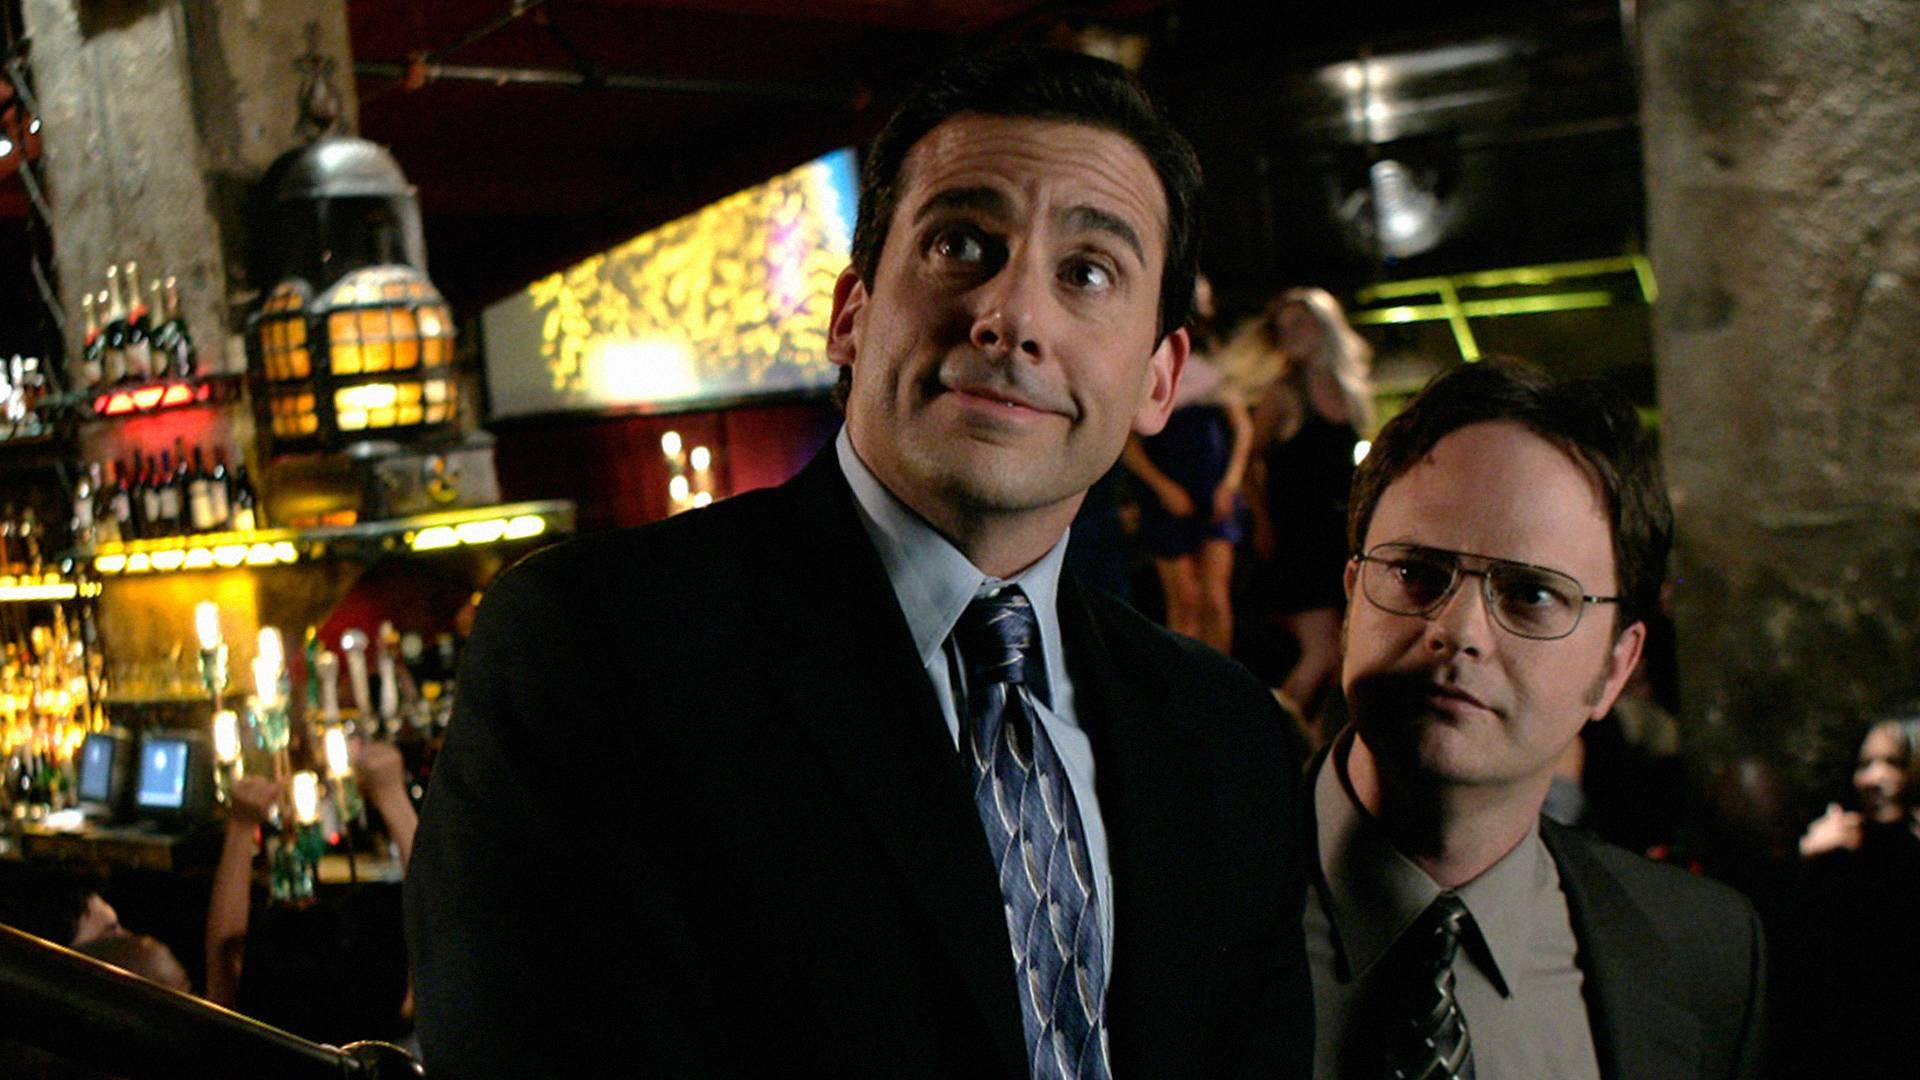 The Office Season 4 Episode 15